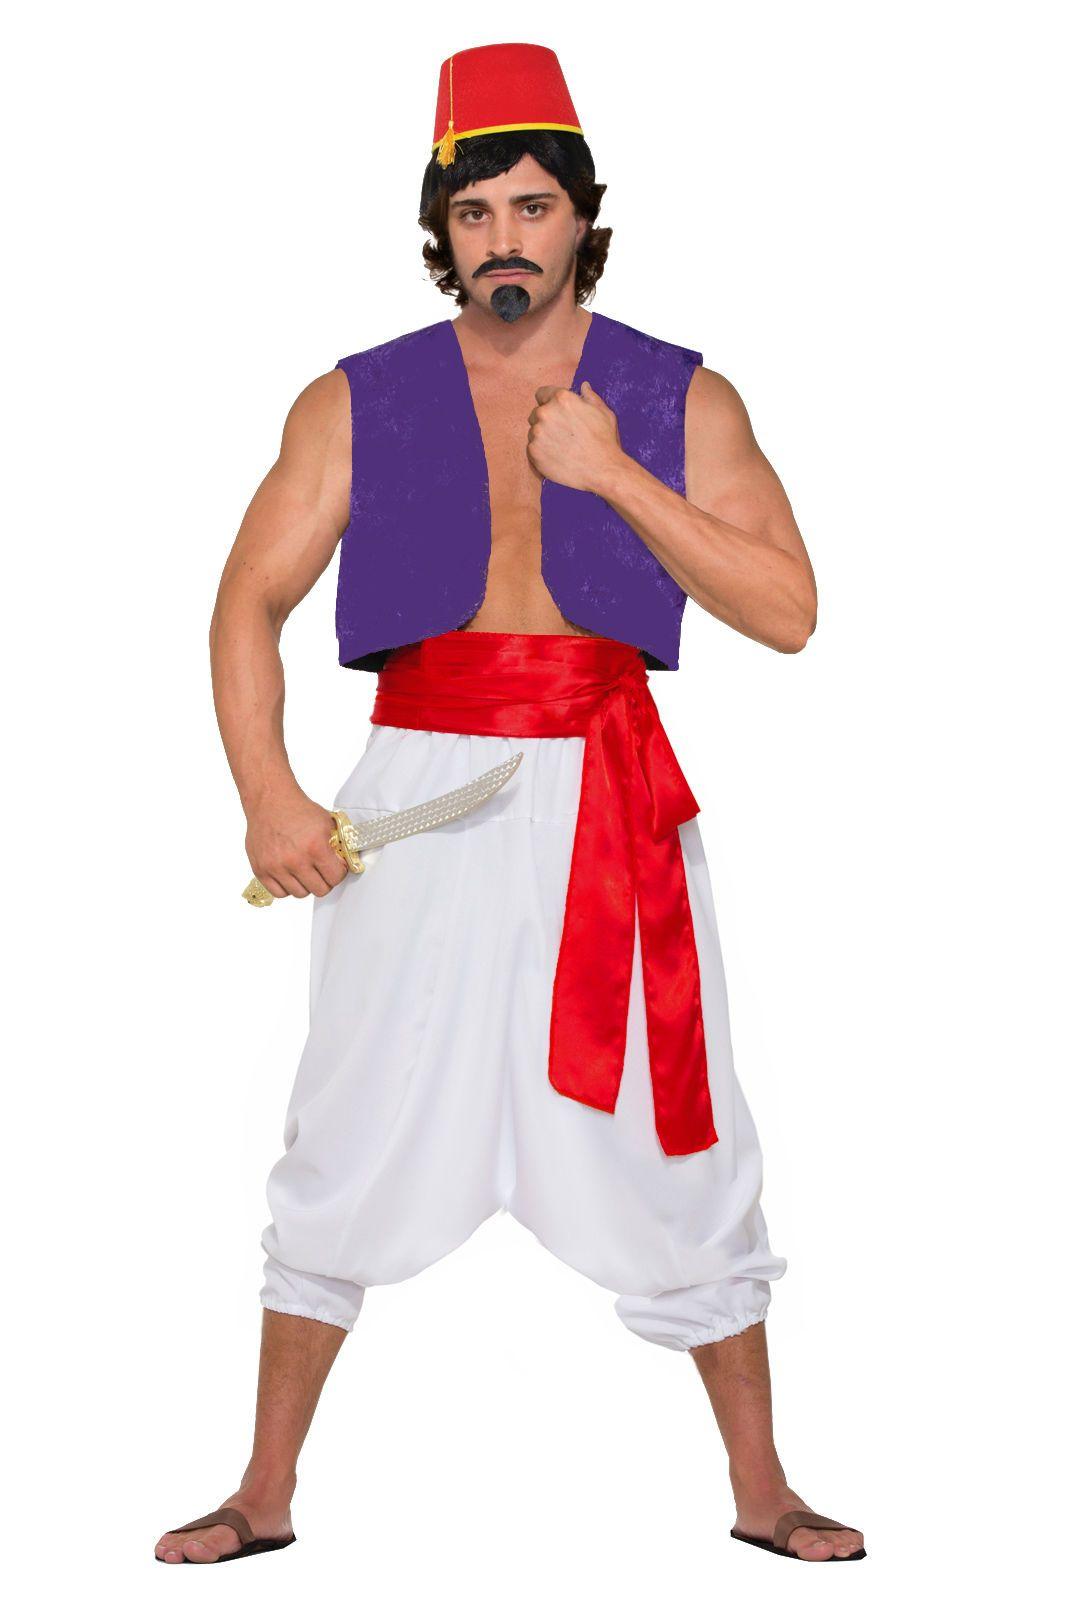 Desert prince aladdin arabian nights whole costume hat vest sash